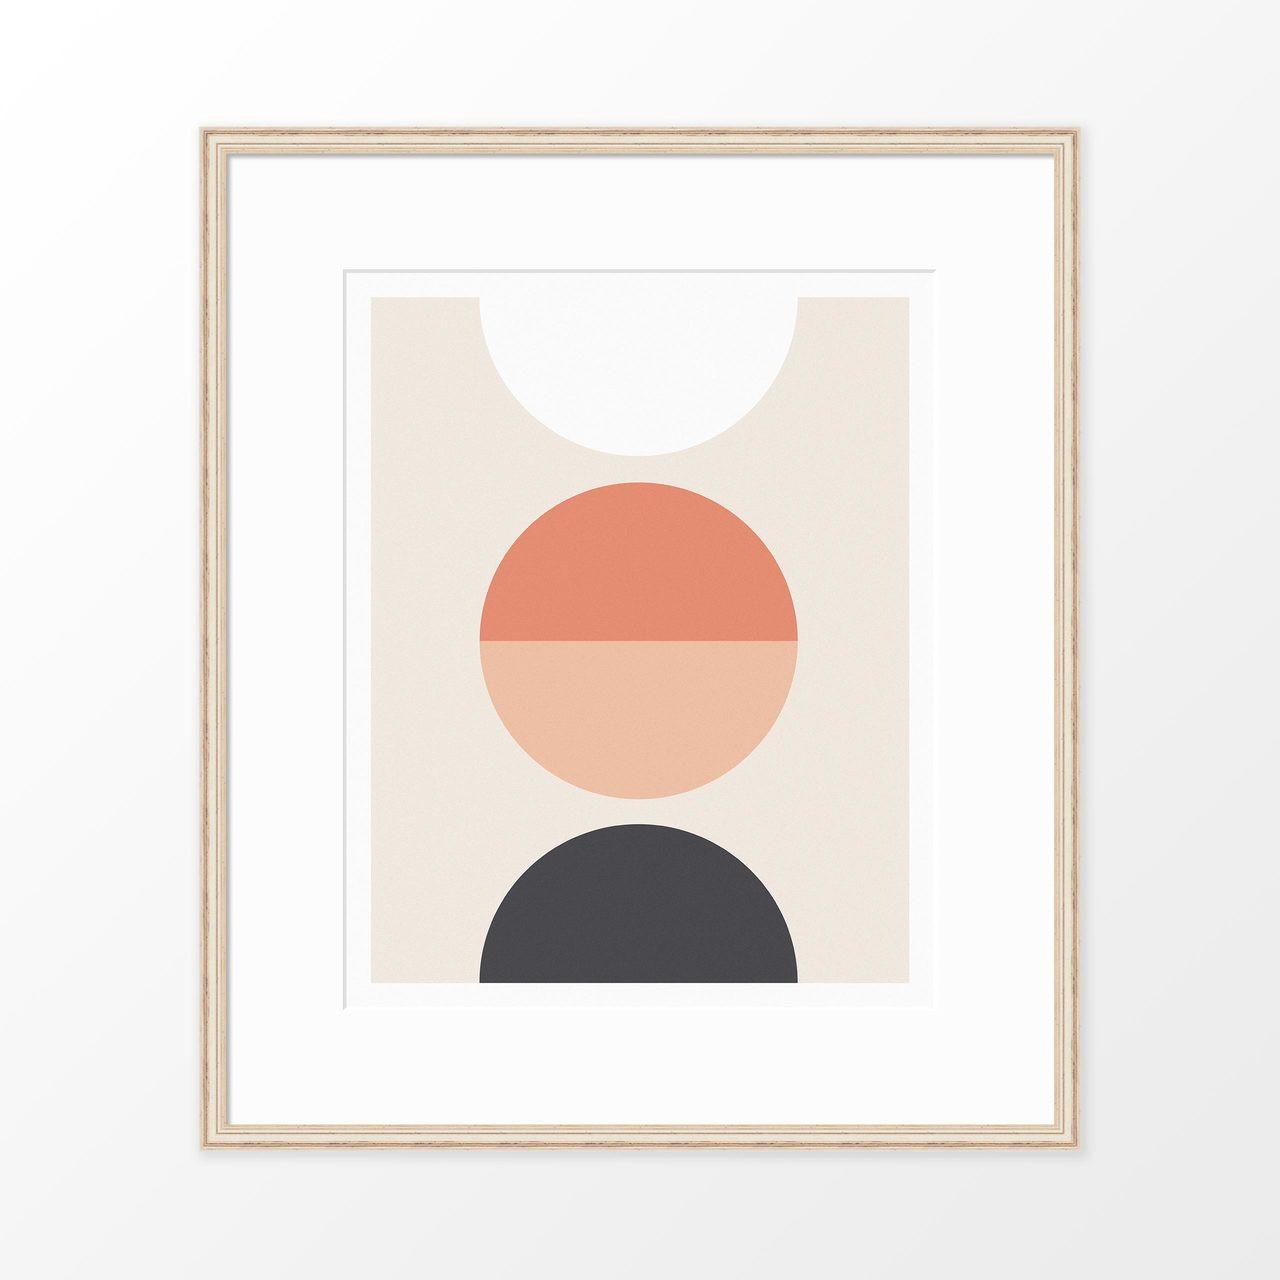 'Luna' Geometric Art Print from The Printed Home